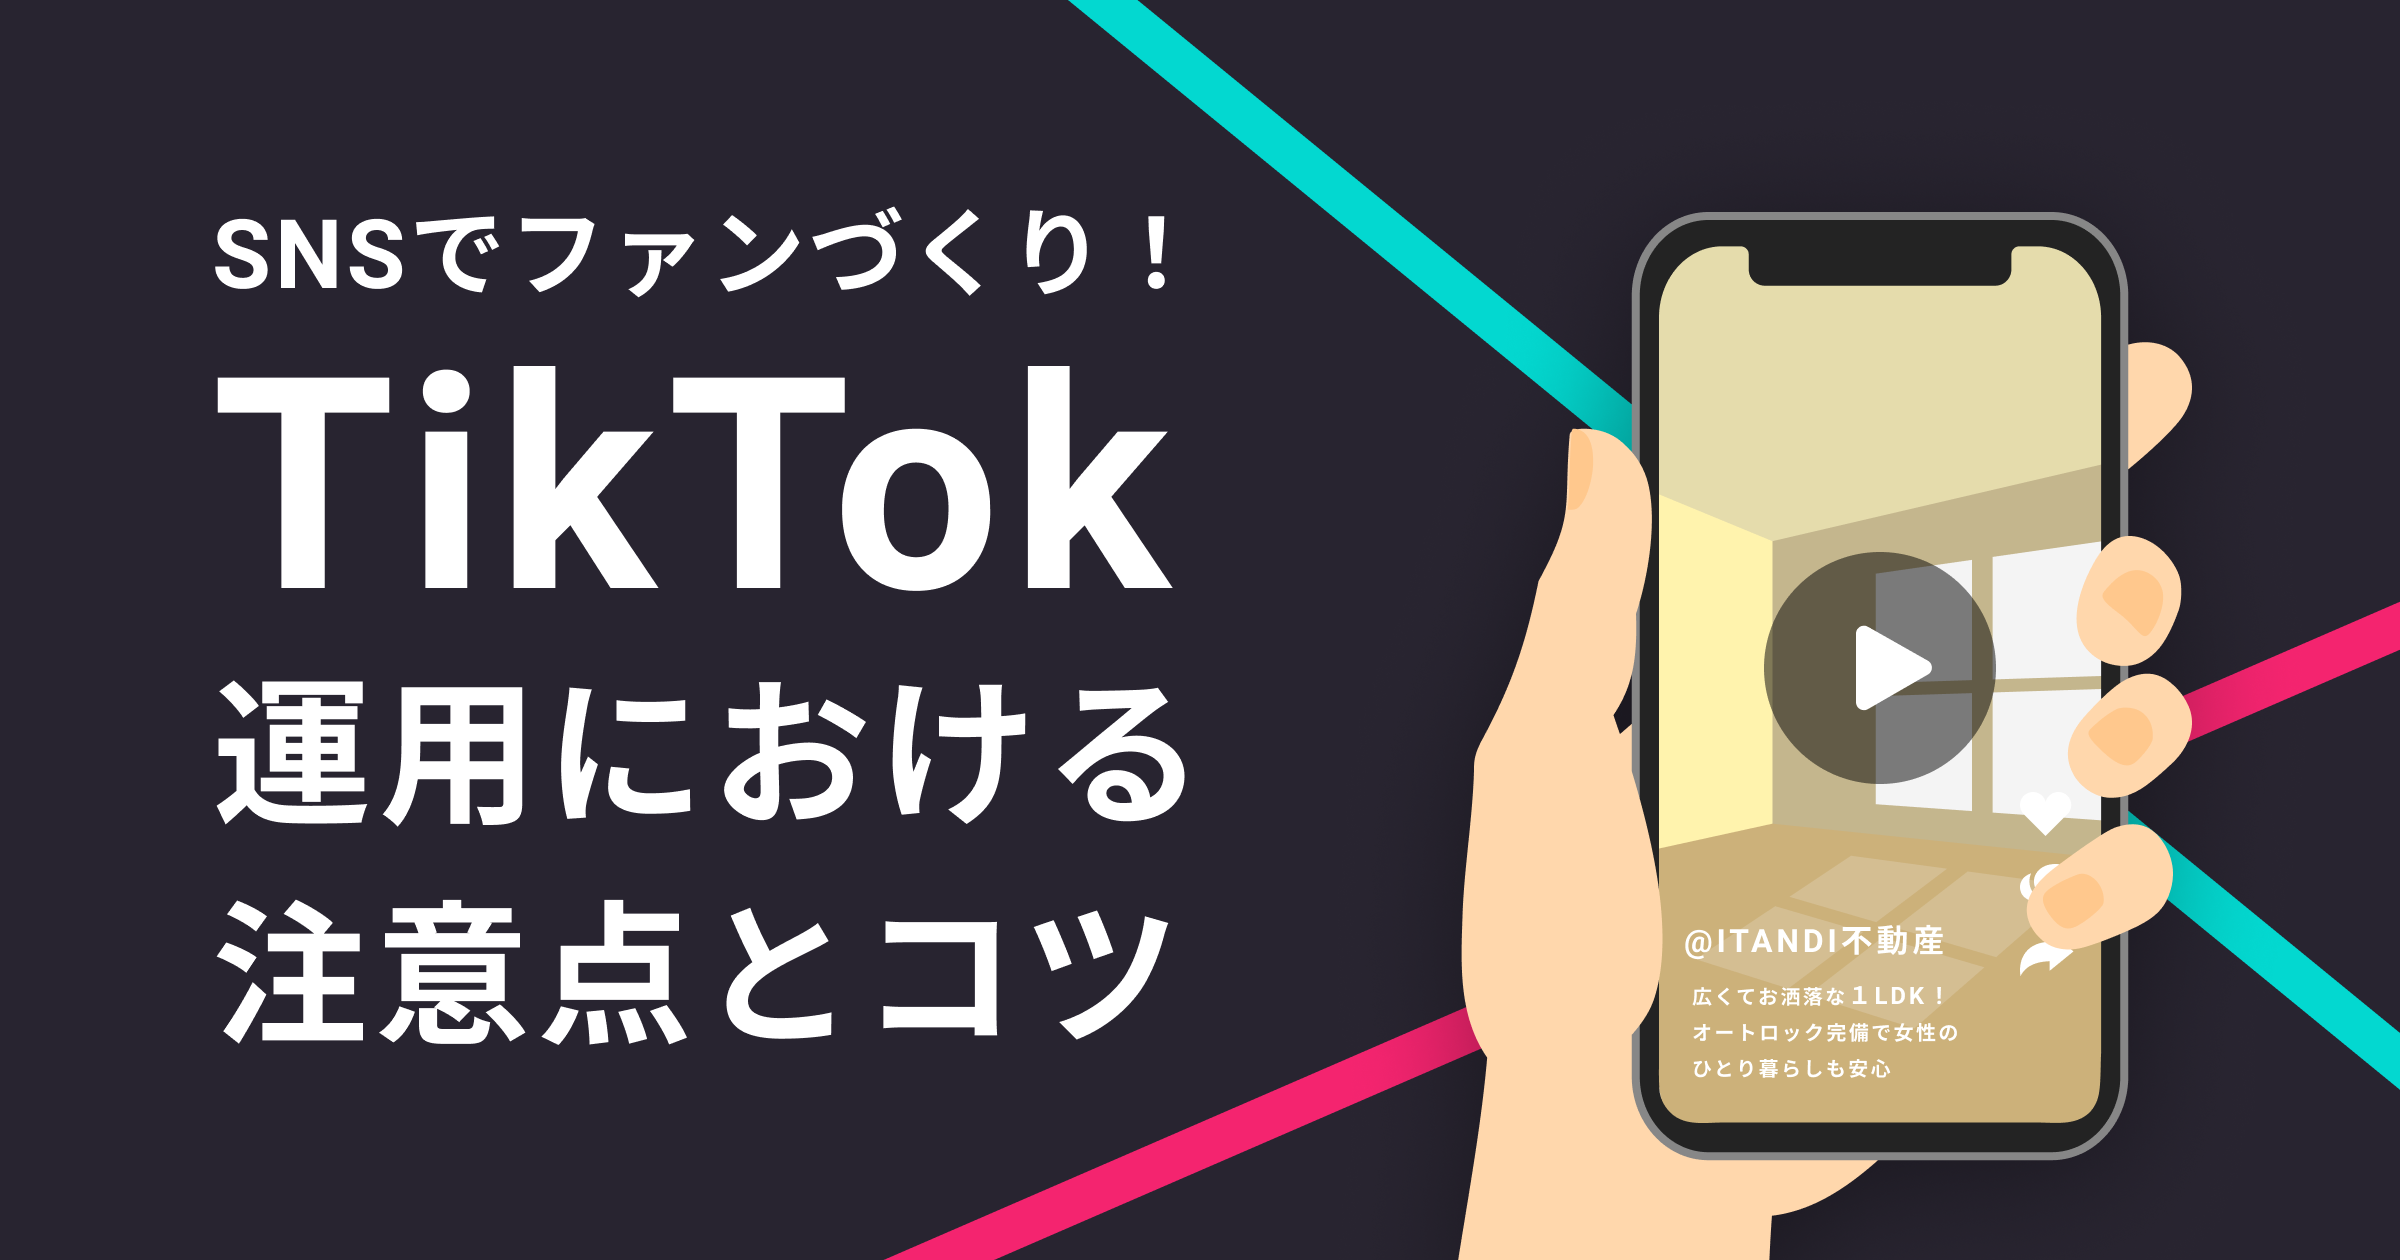 OGPImage_SNSでファンづくり! TikTok運用における注意点とコツ-1